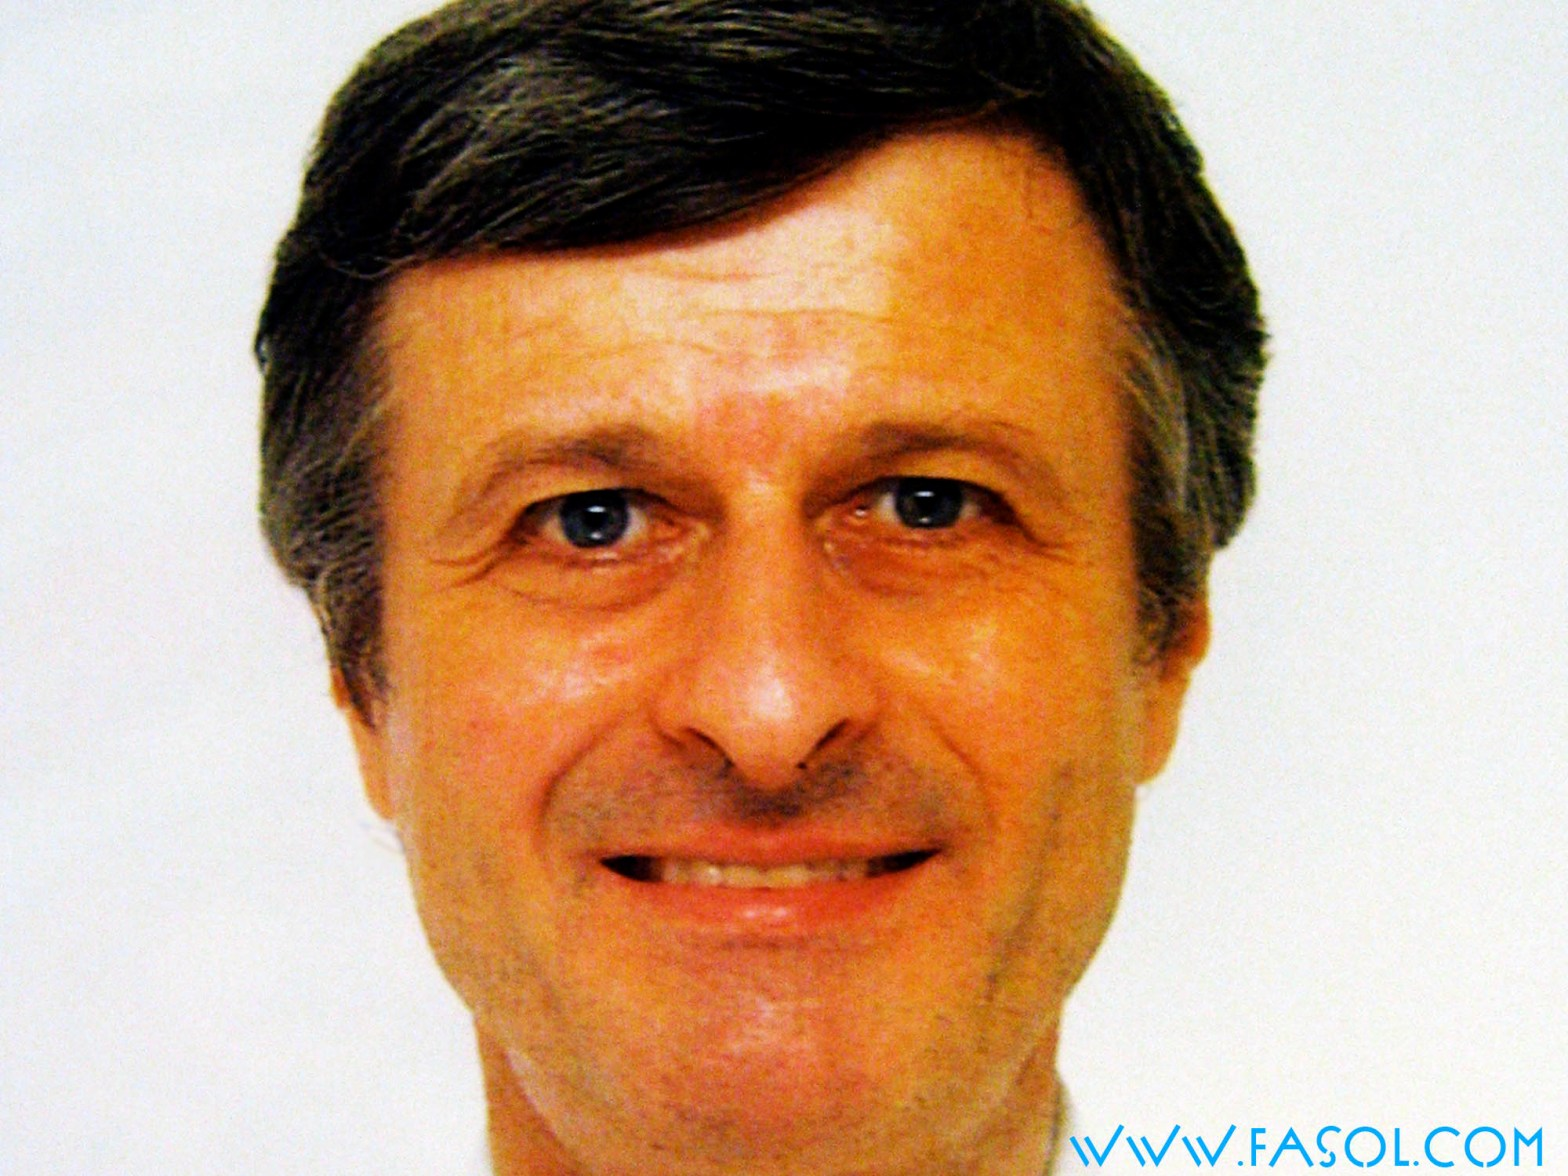 Gerhard Fasol http://fasol.com/